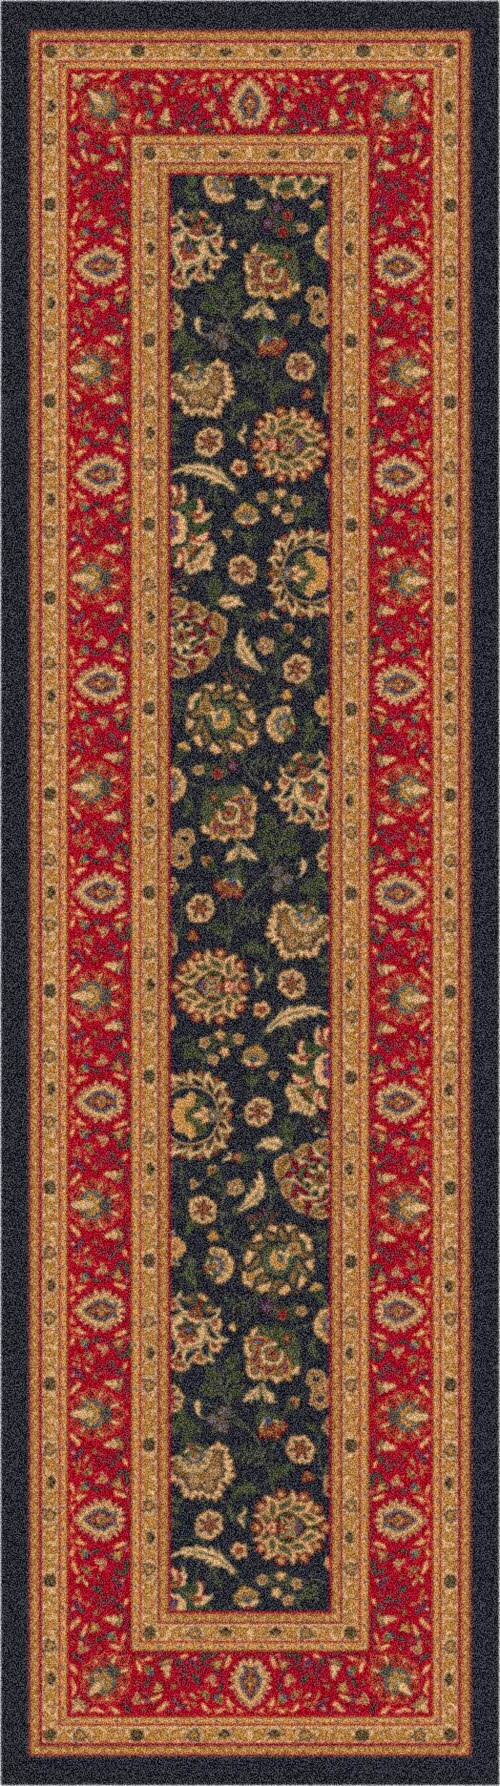 Ebony (24)  Traditional / Oriental Area Rug